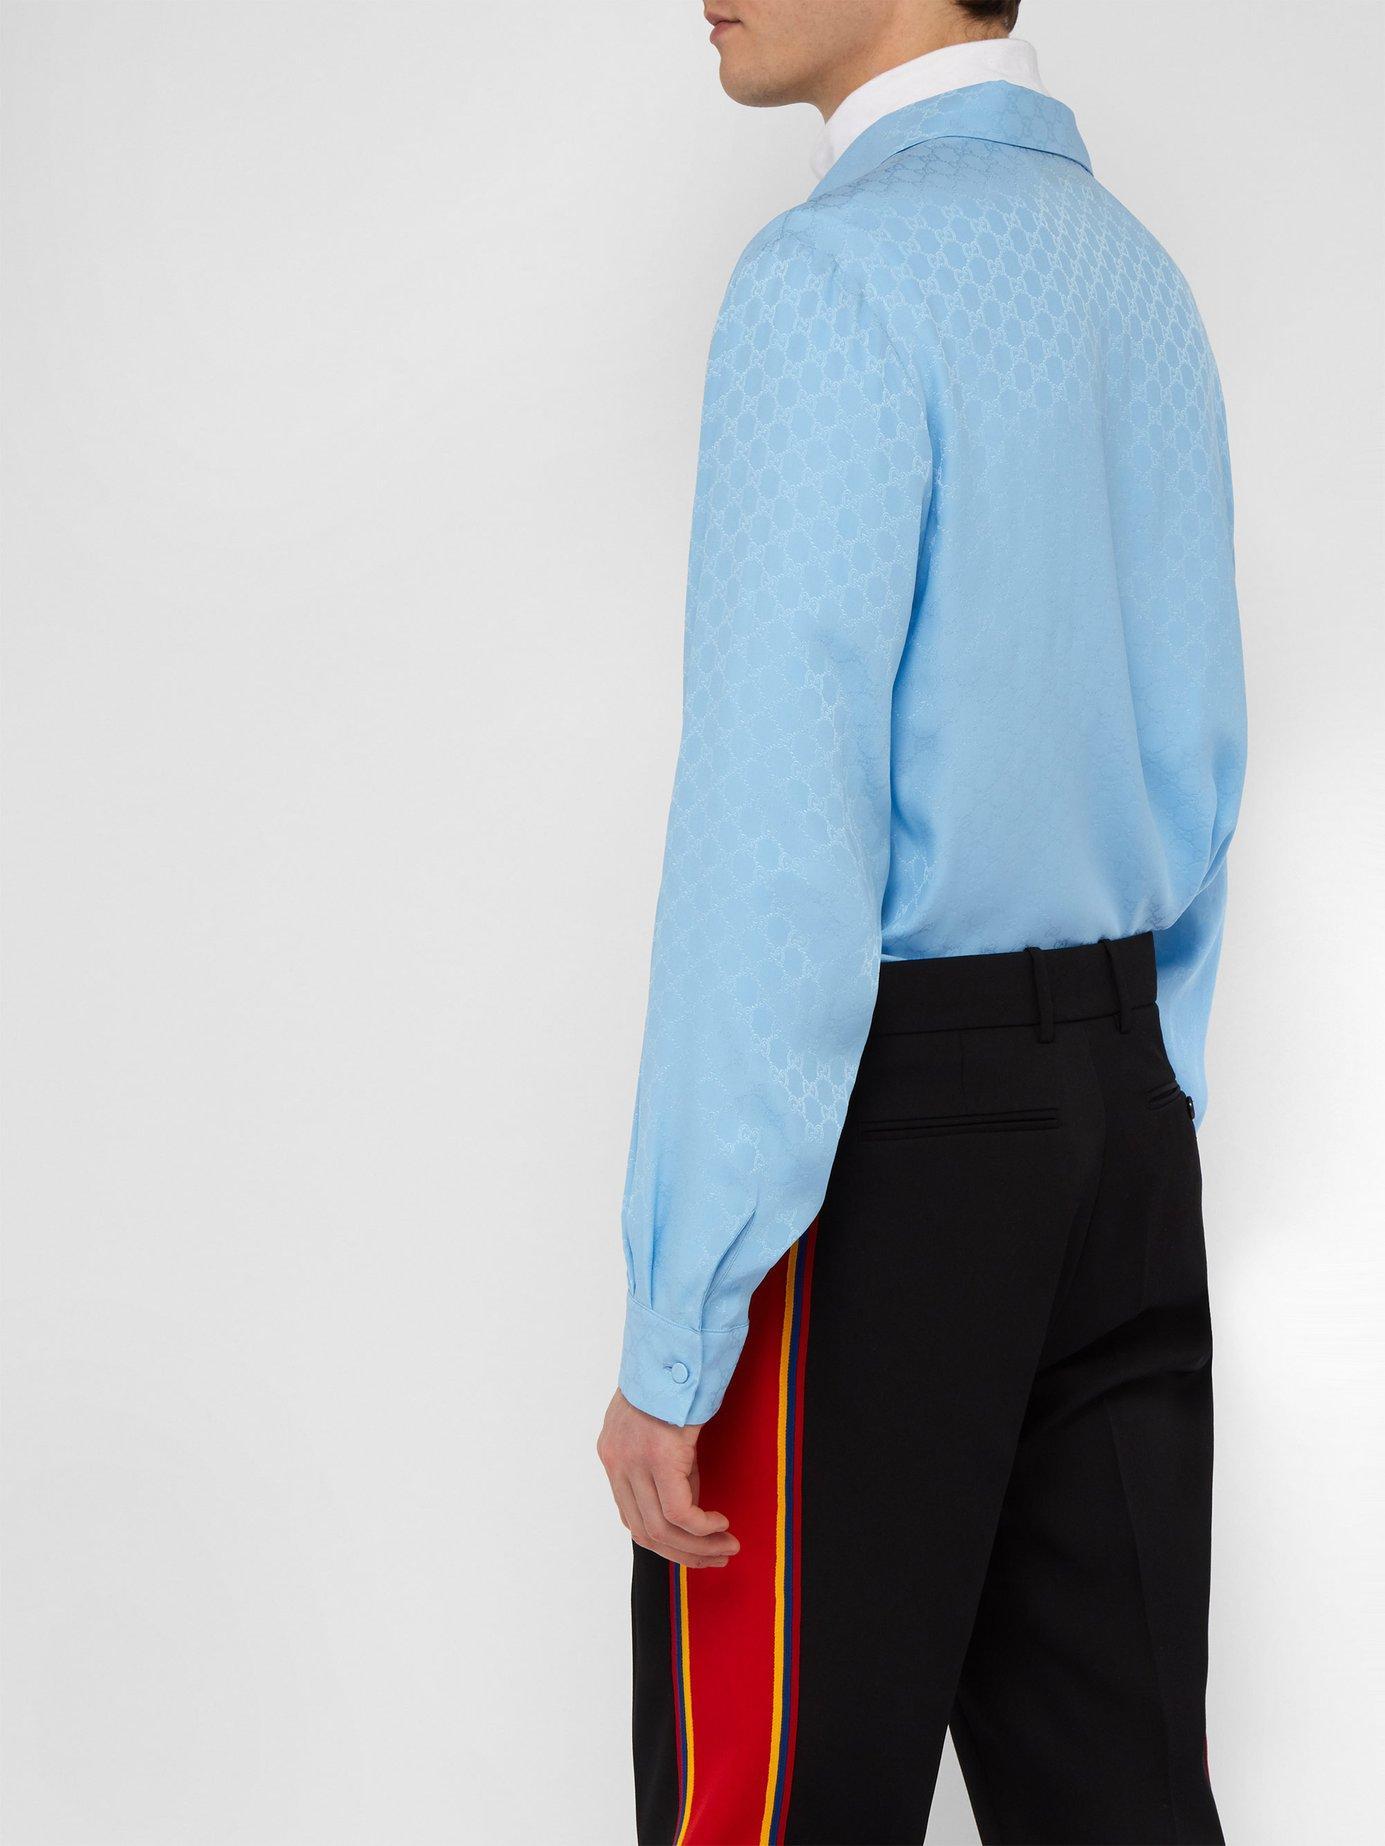 af0e29d25ac Lyst - Gucci Gg Supreme Print Silk Crepe Shirt in Blue for Men